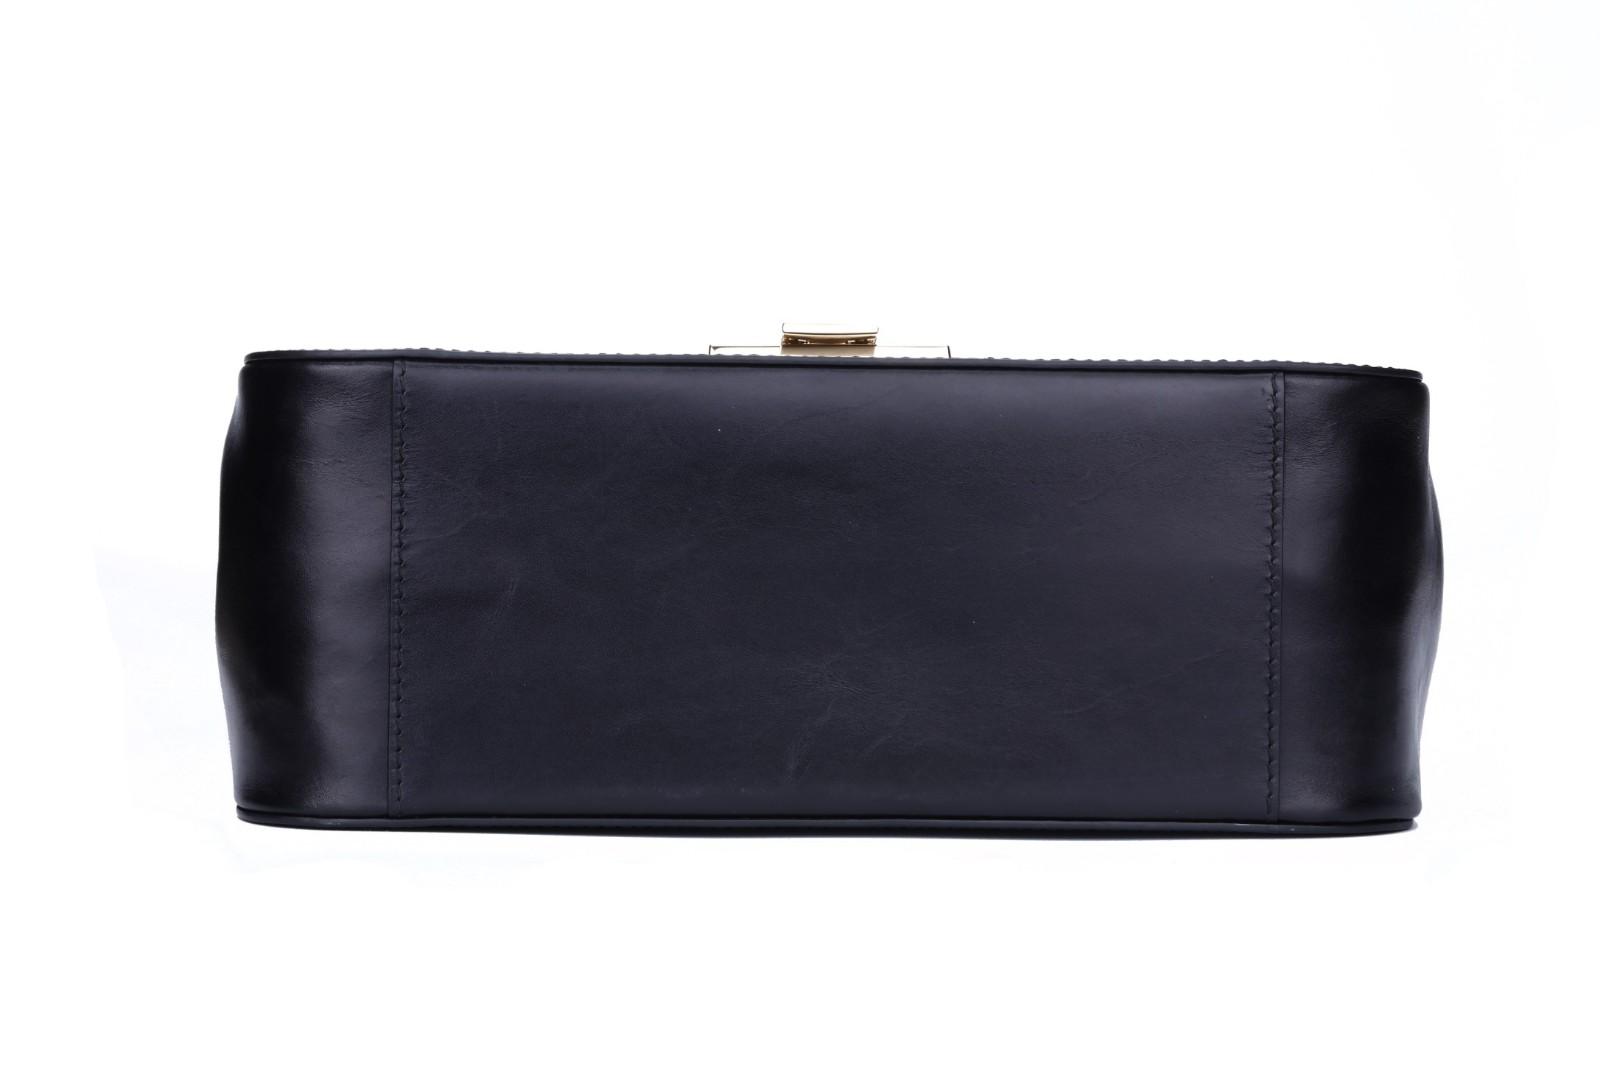 GF bags-Professional Ladies Bag Affordable Handbags From Gaofeng Bags-7